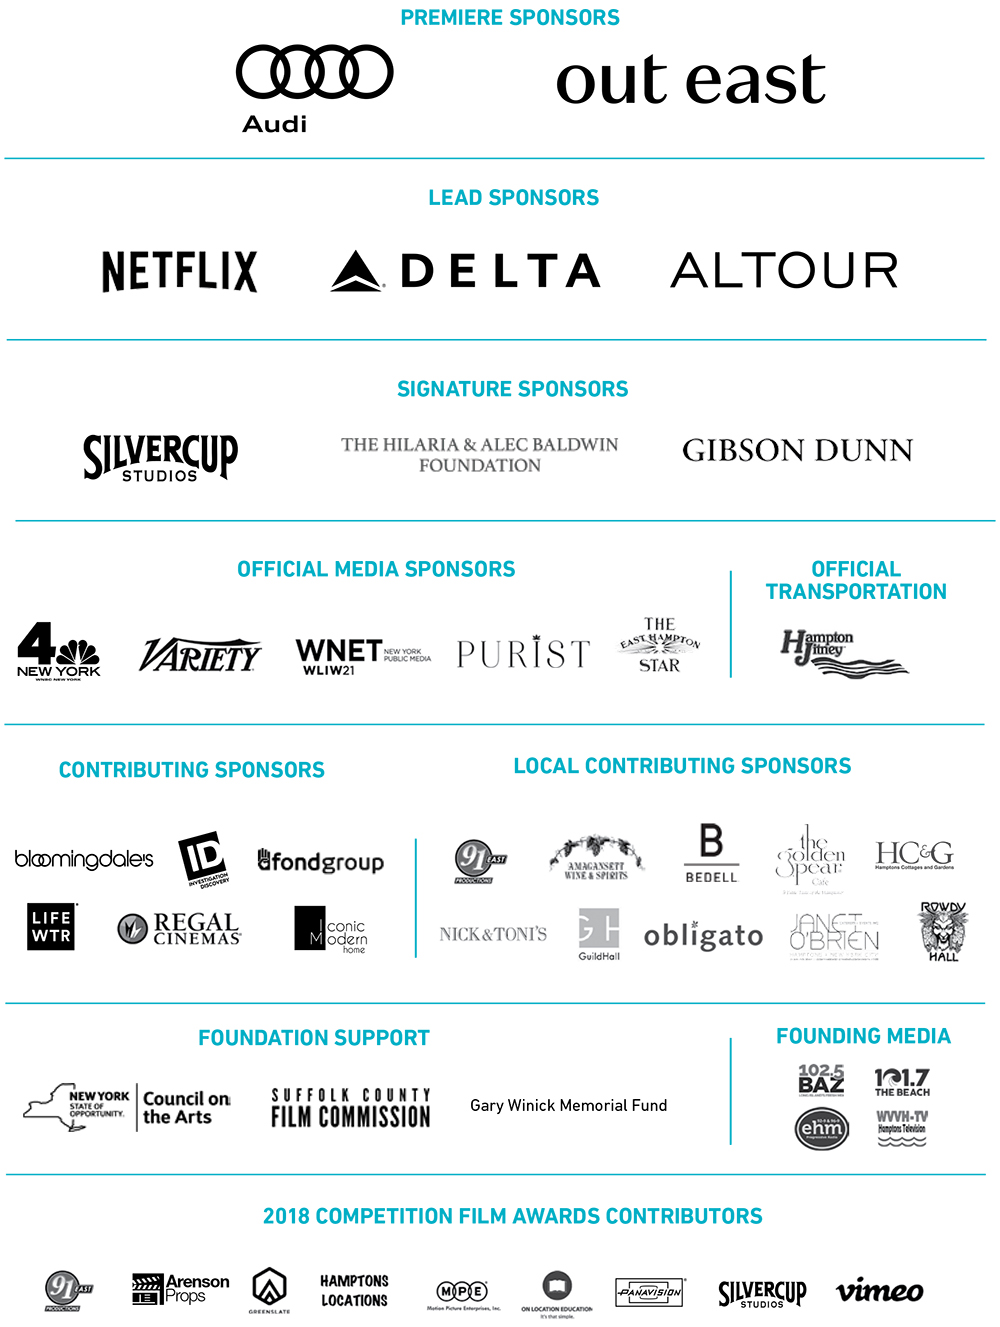 HIFF 2018 Sponsors page 1000